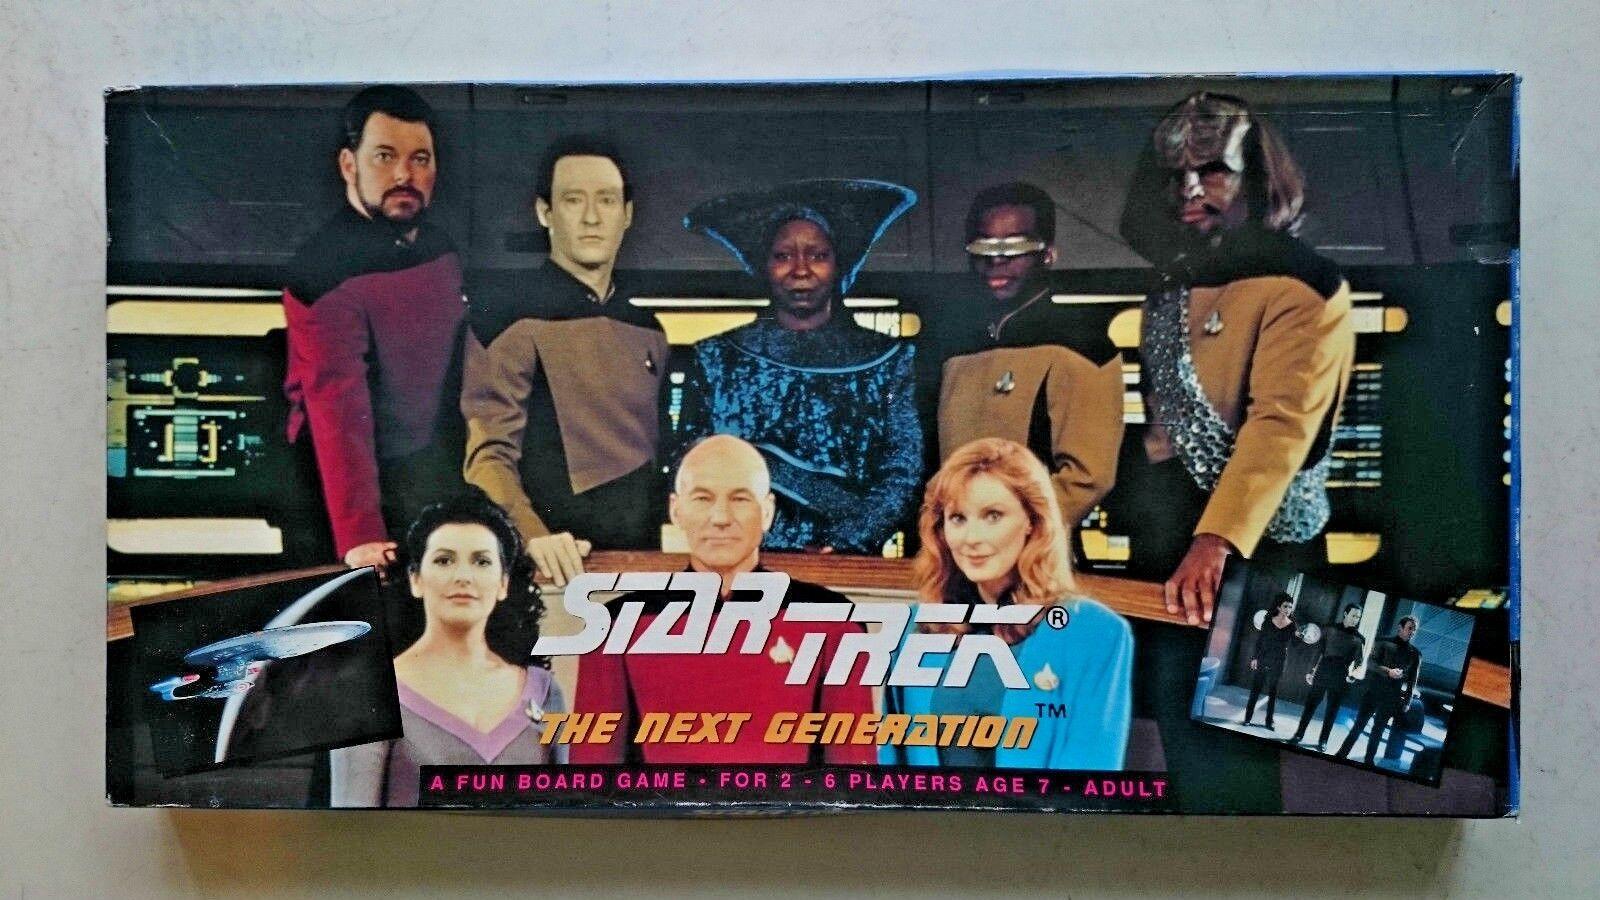 Star Trek The Next Generation  by BMI 1992